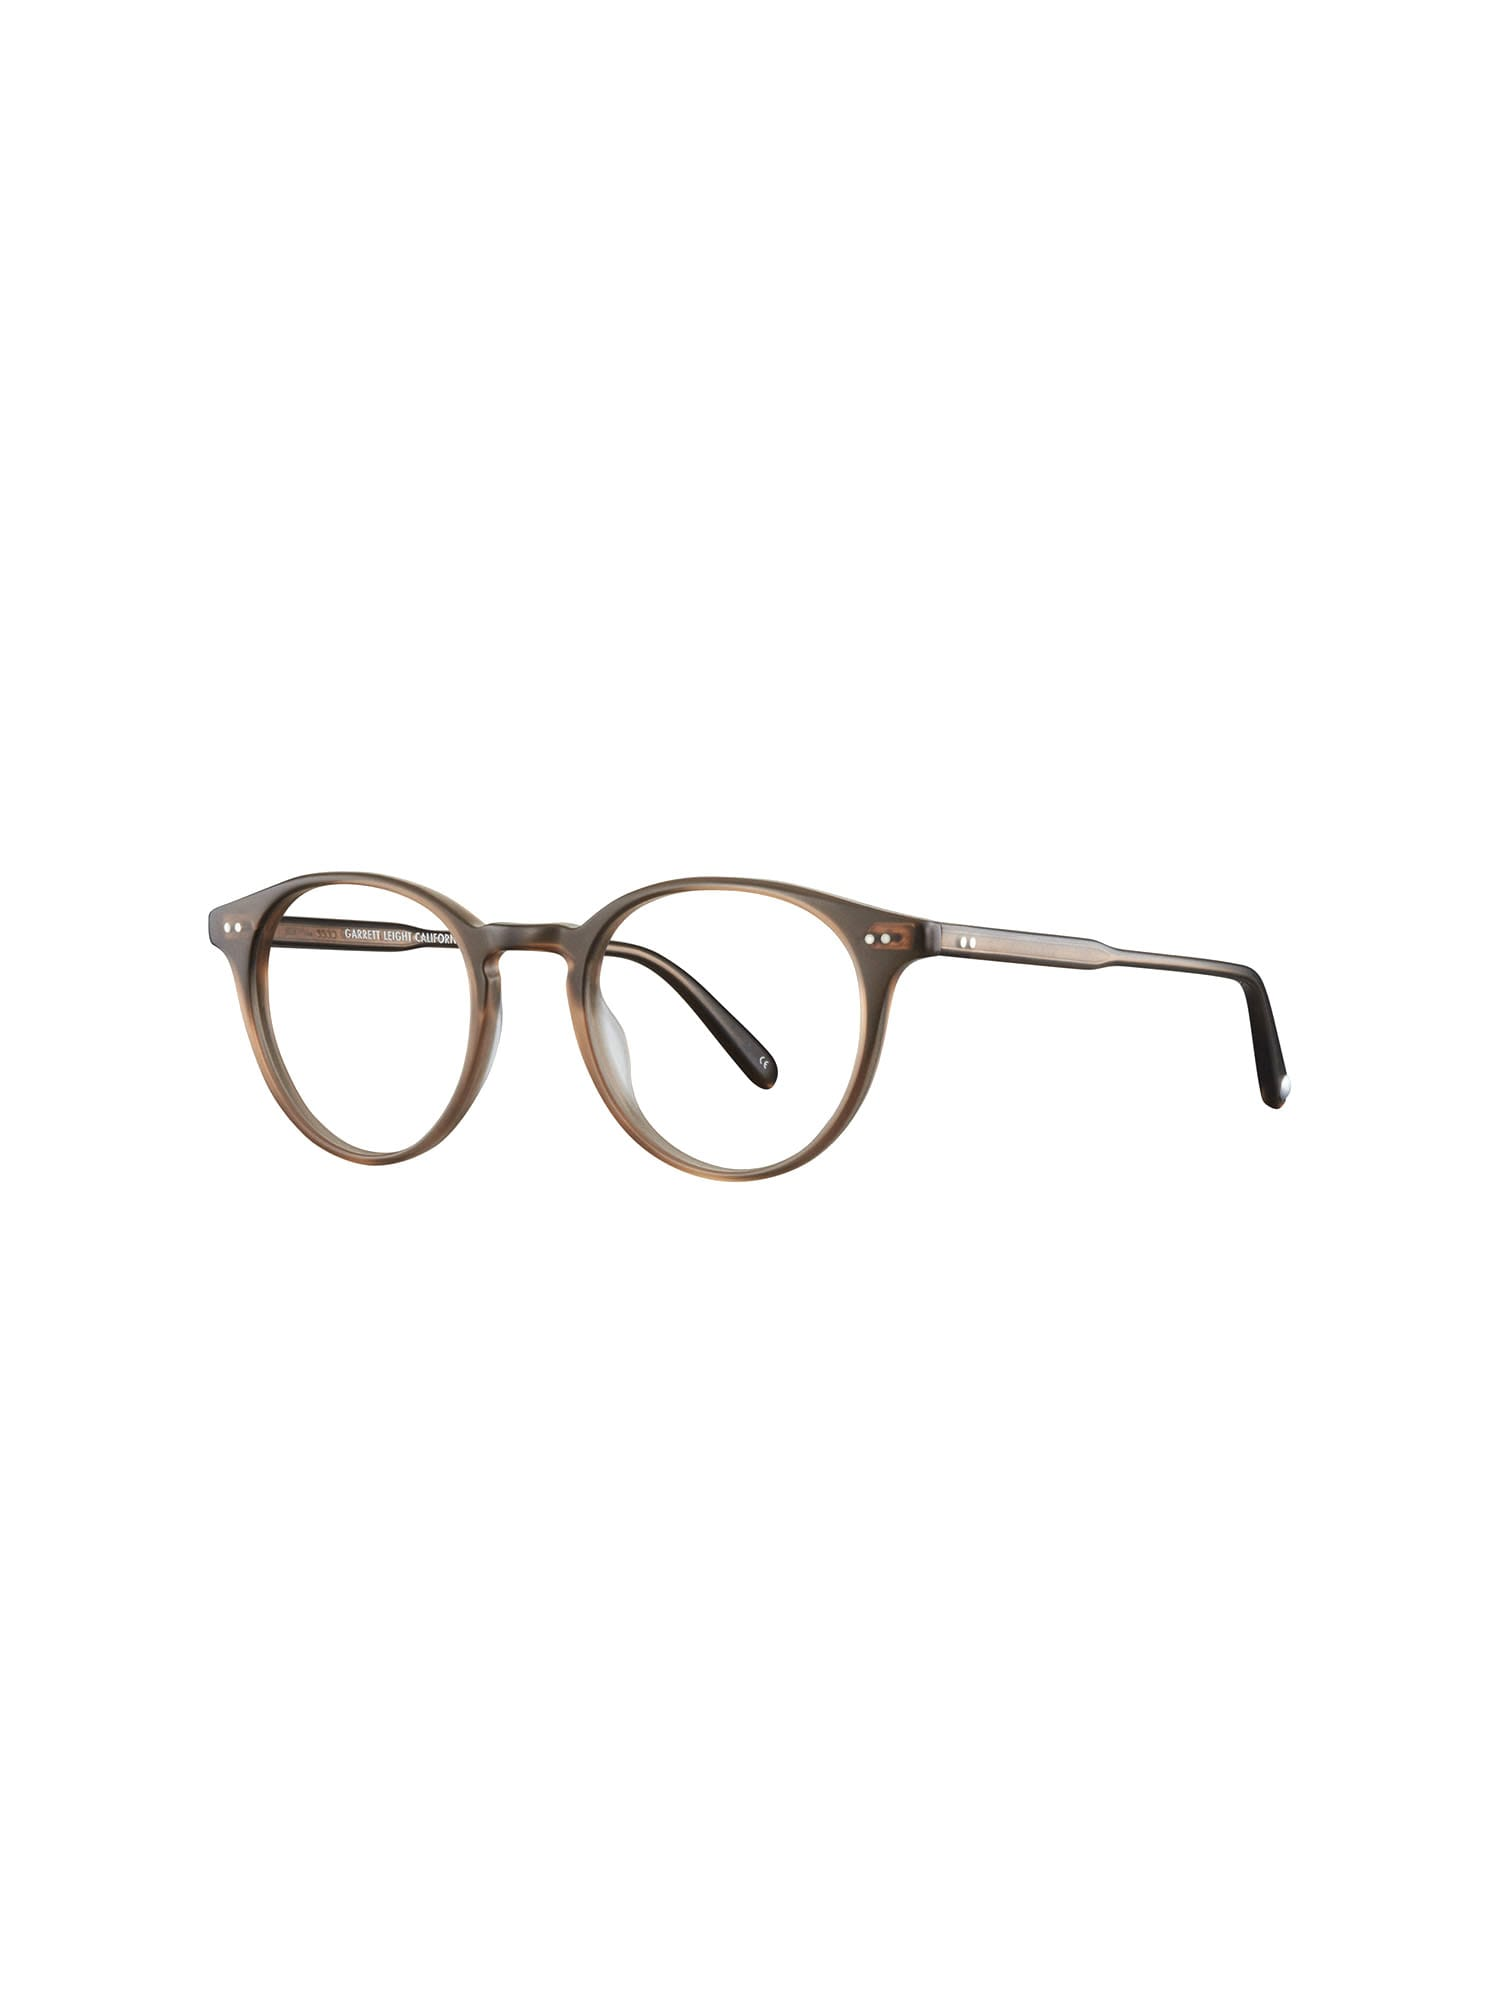 Garrett Leight 1047/47 CLUNE Eyewear